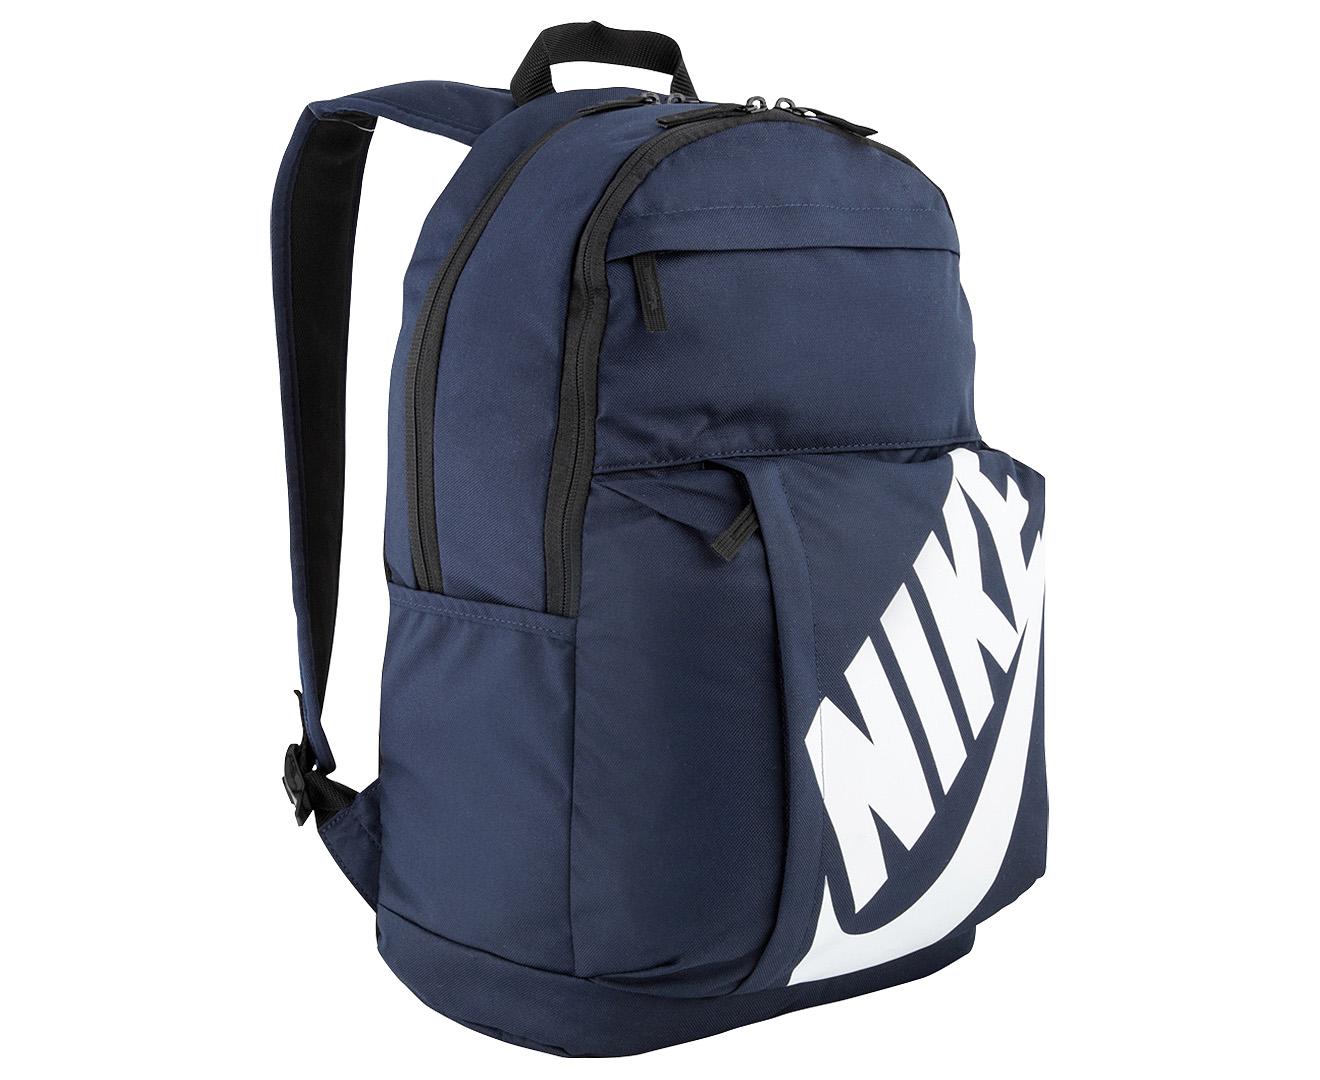 Real vs fake Nike Back pack. How to spot fake NIKE bags